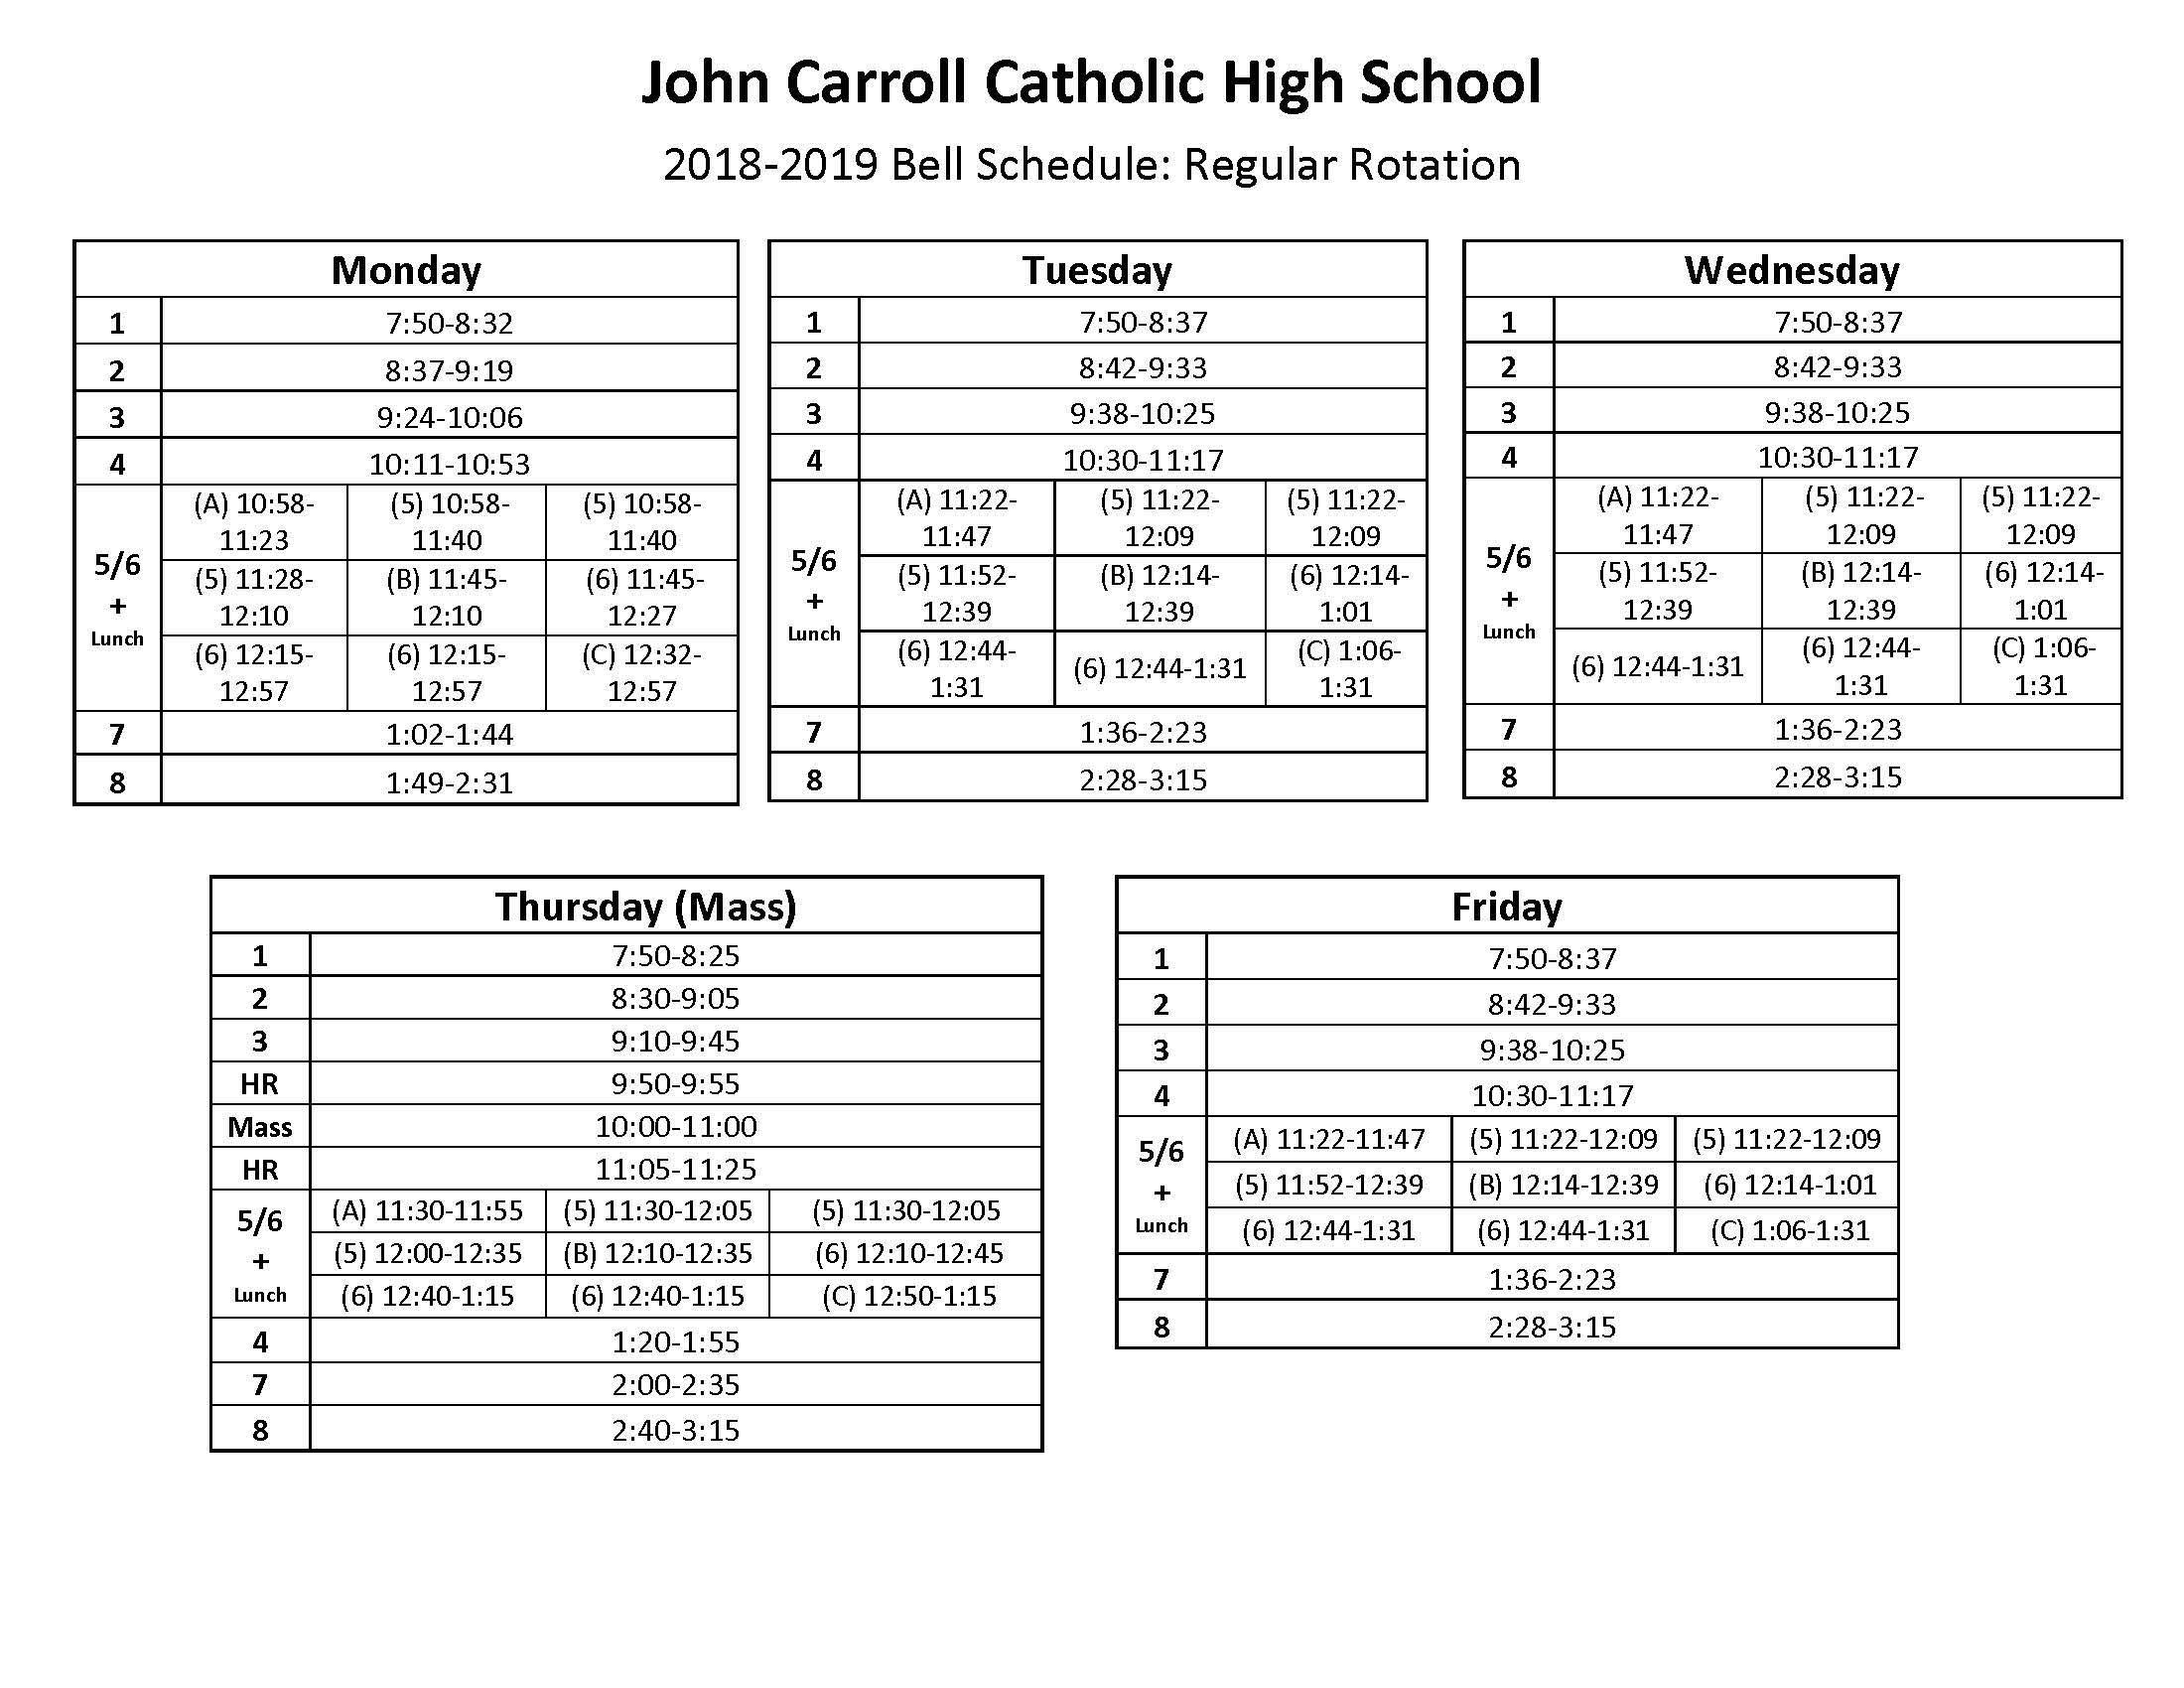 Bell Schedule & Summary Calendar – Students